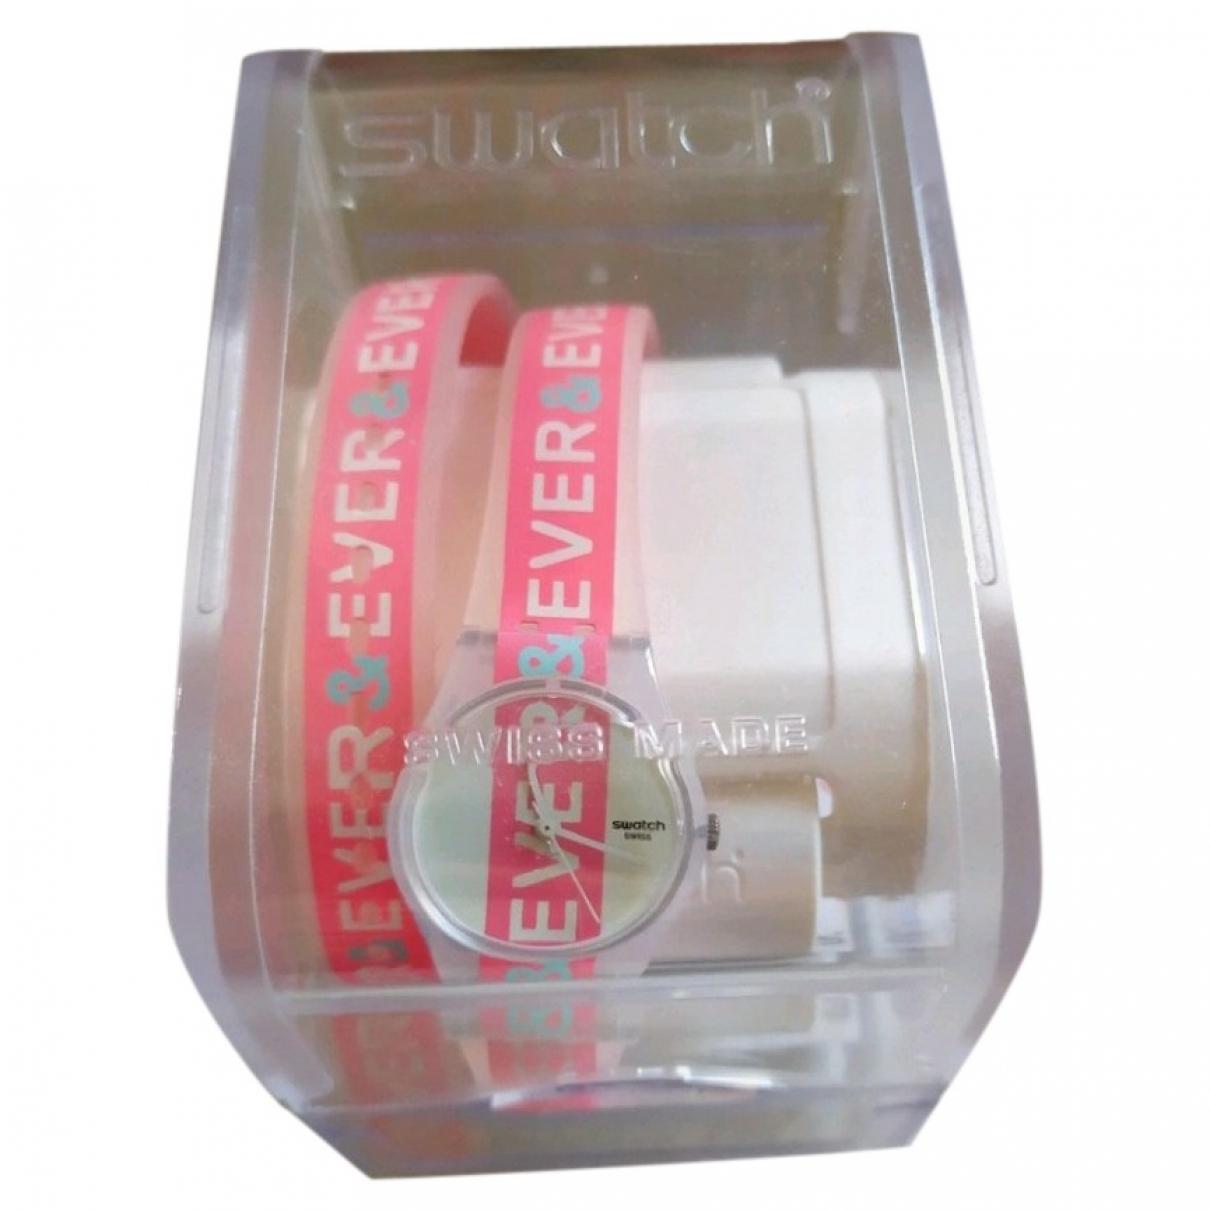 Swatch \N Pink watch for Women \N